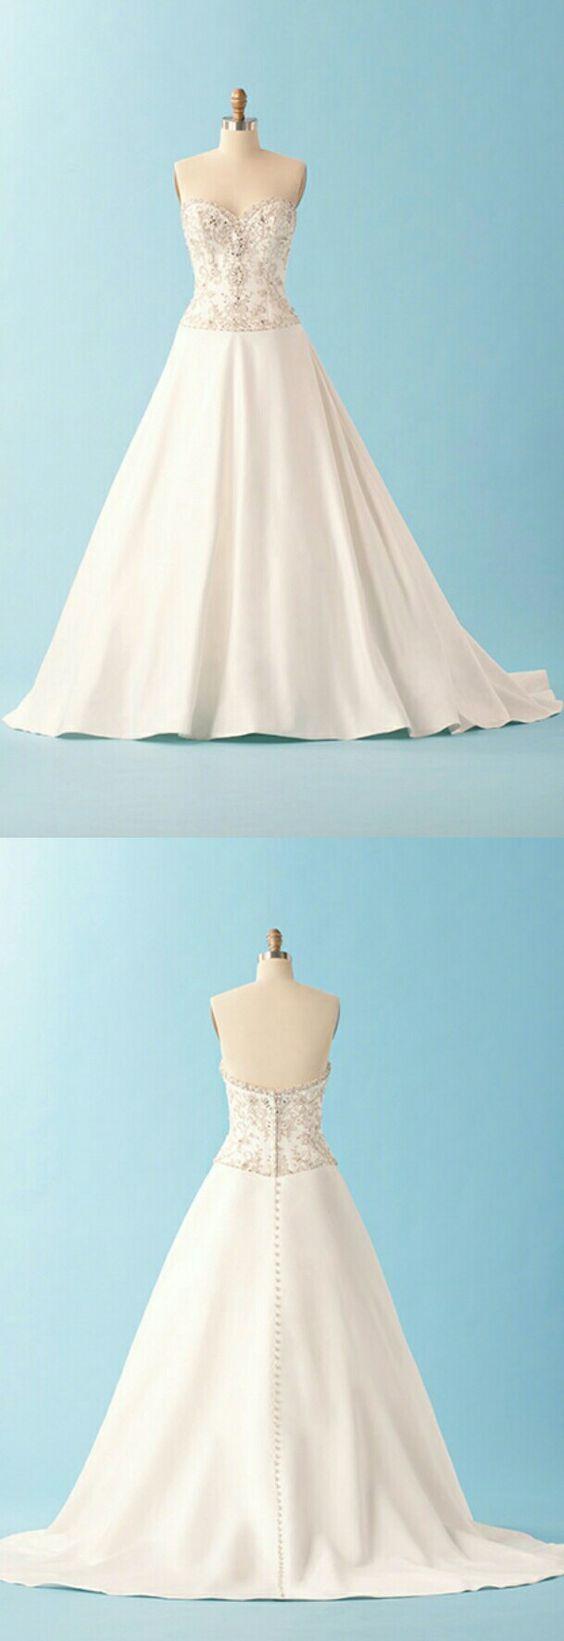 Attractive Alfred Angelo Disney Princess Wedding Dresses Photos ...